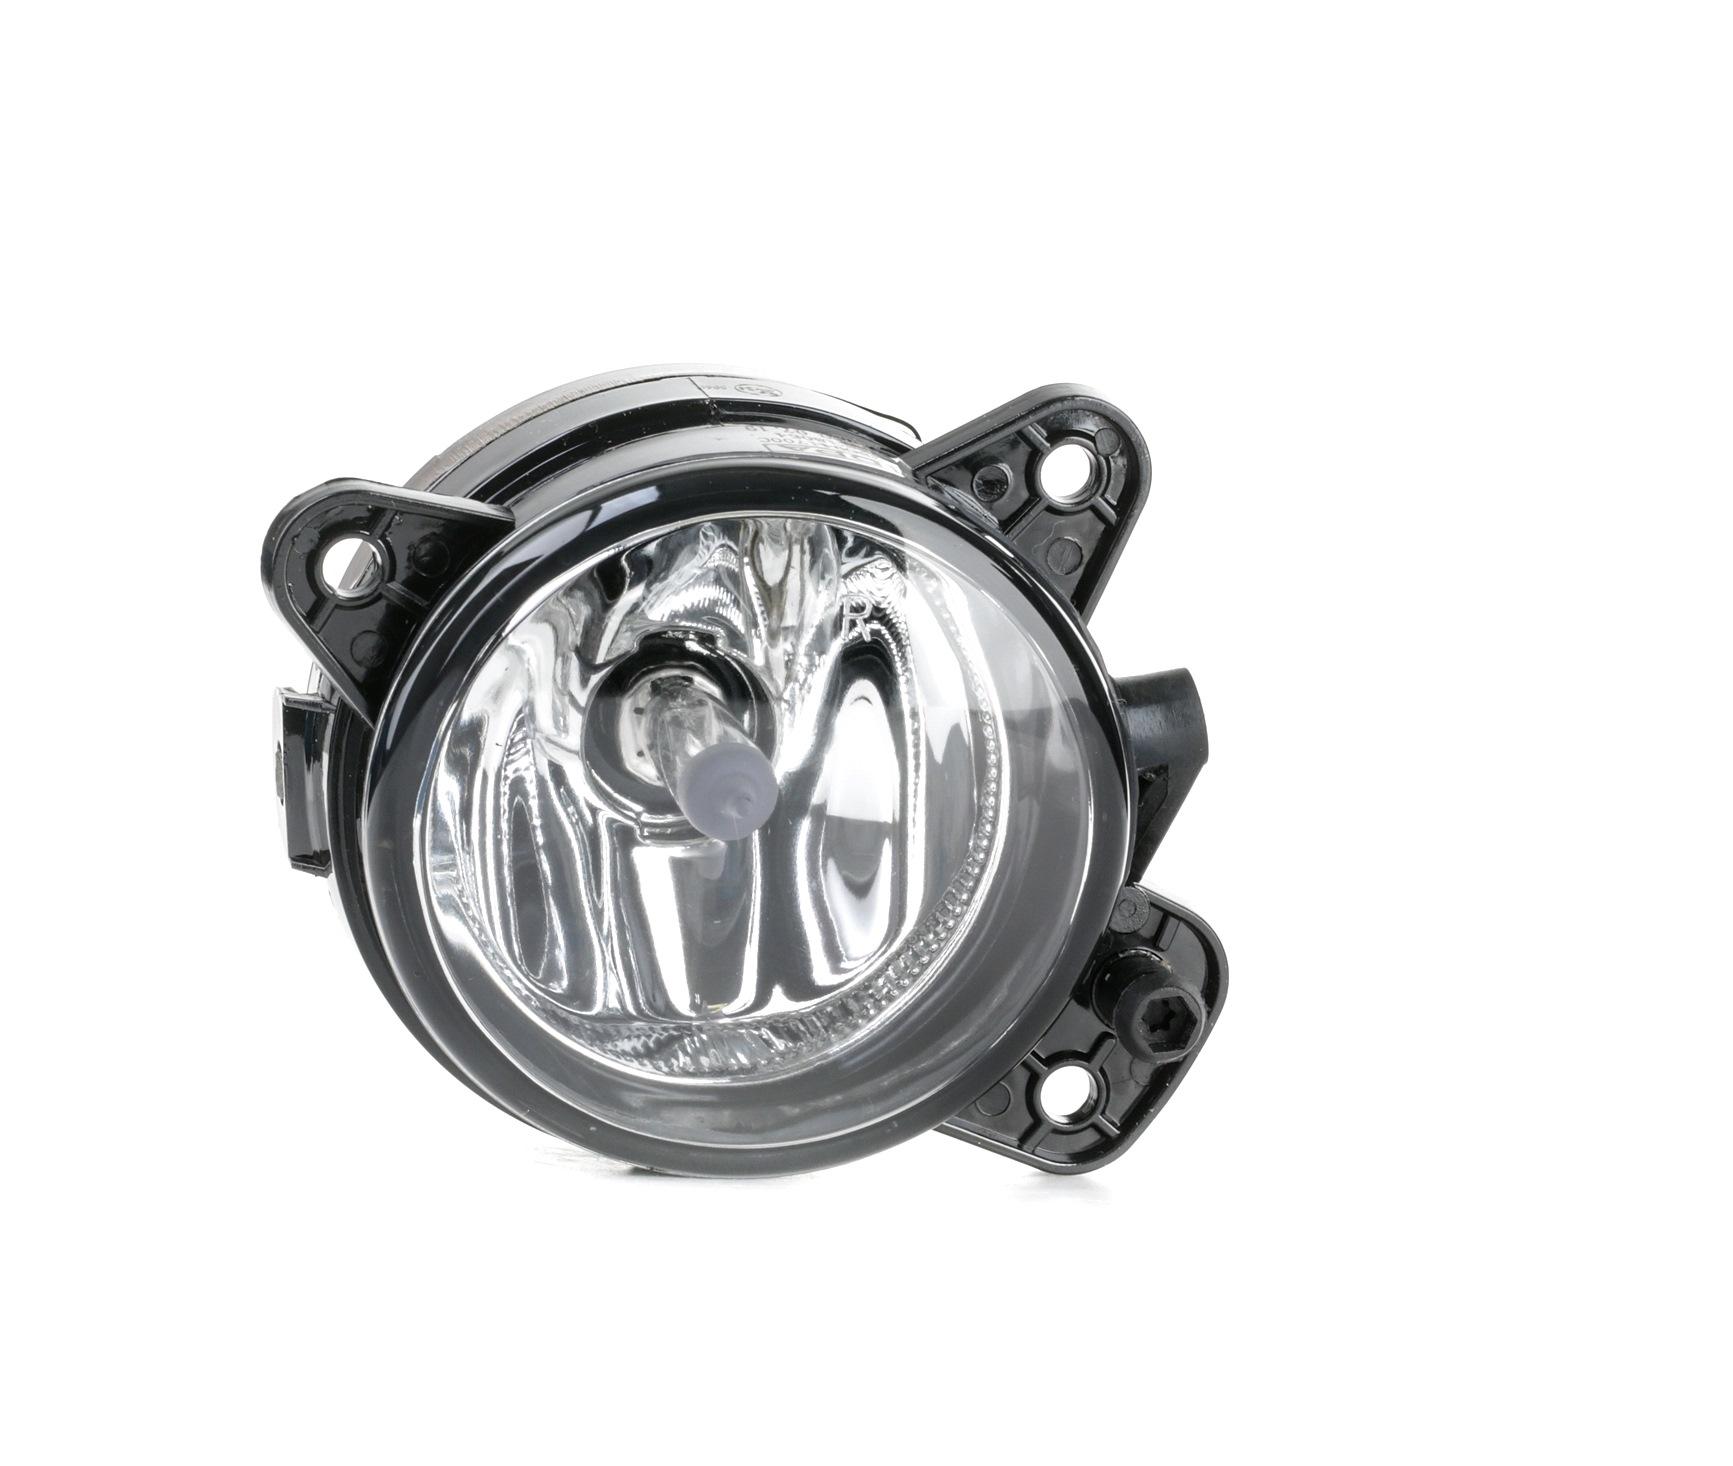 Nebelscheinwerfer DPA 89410223302 Bewertung